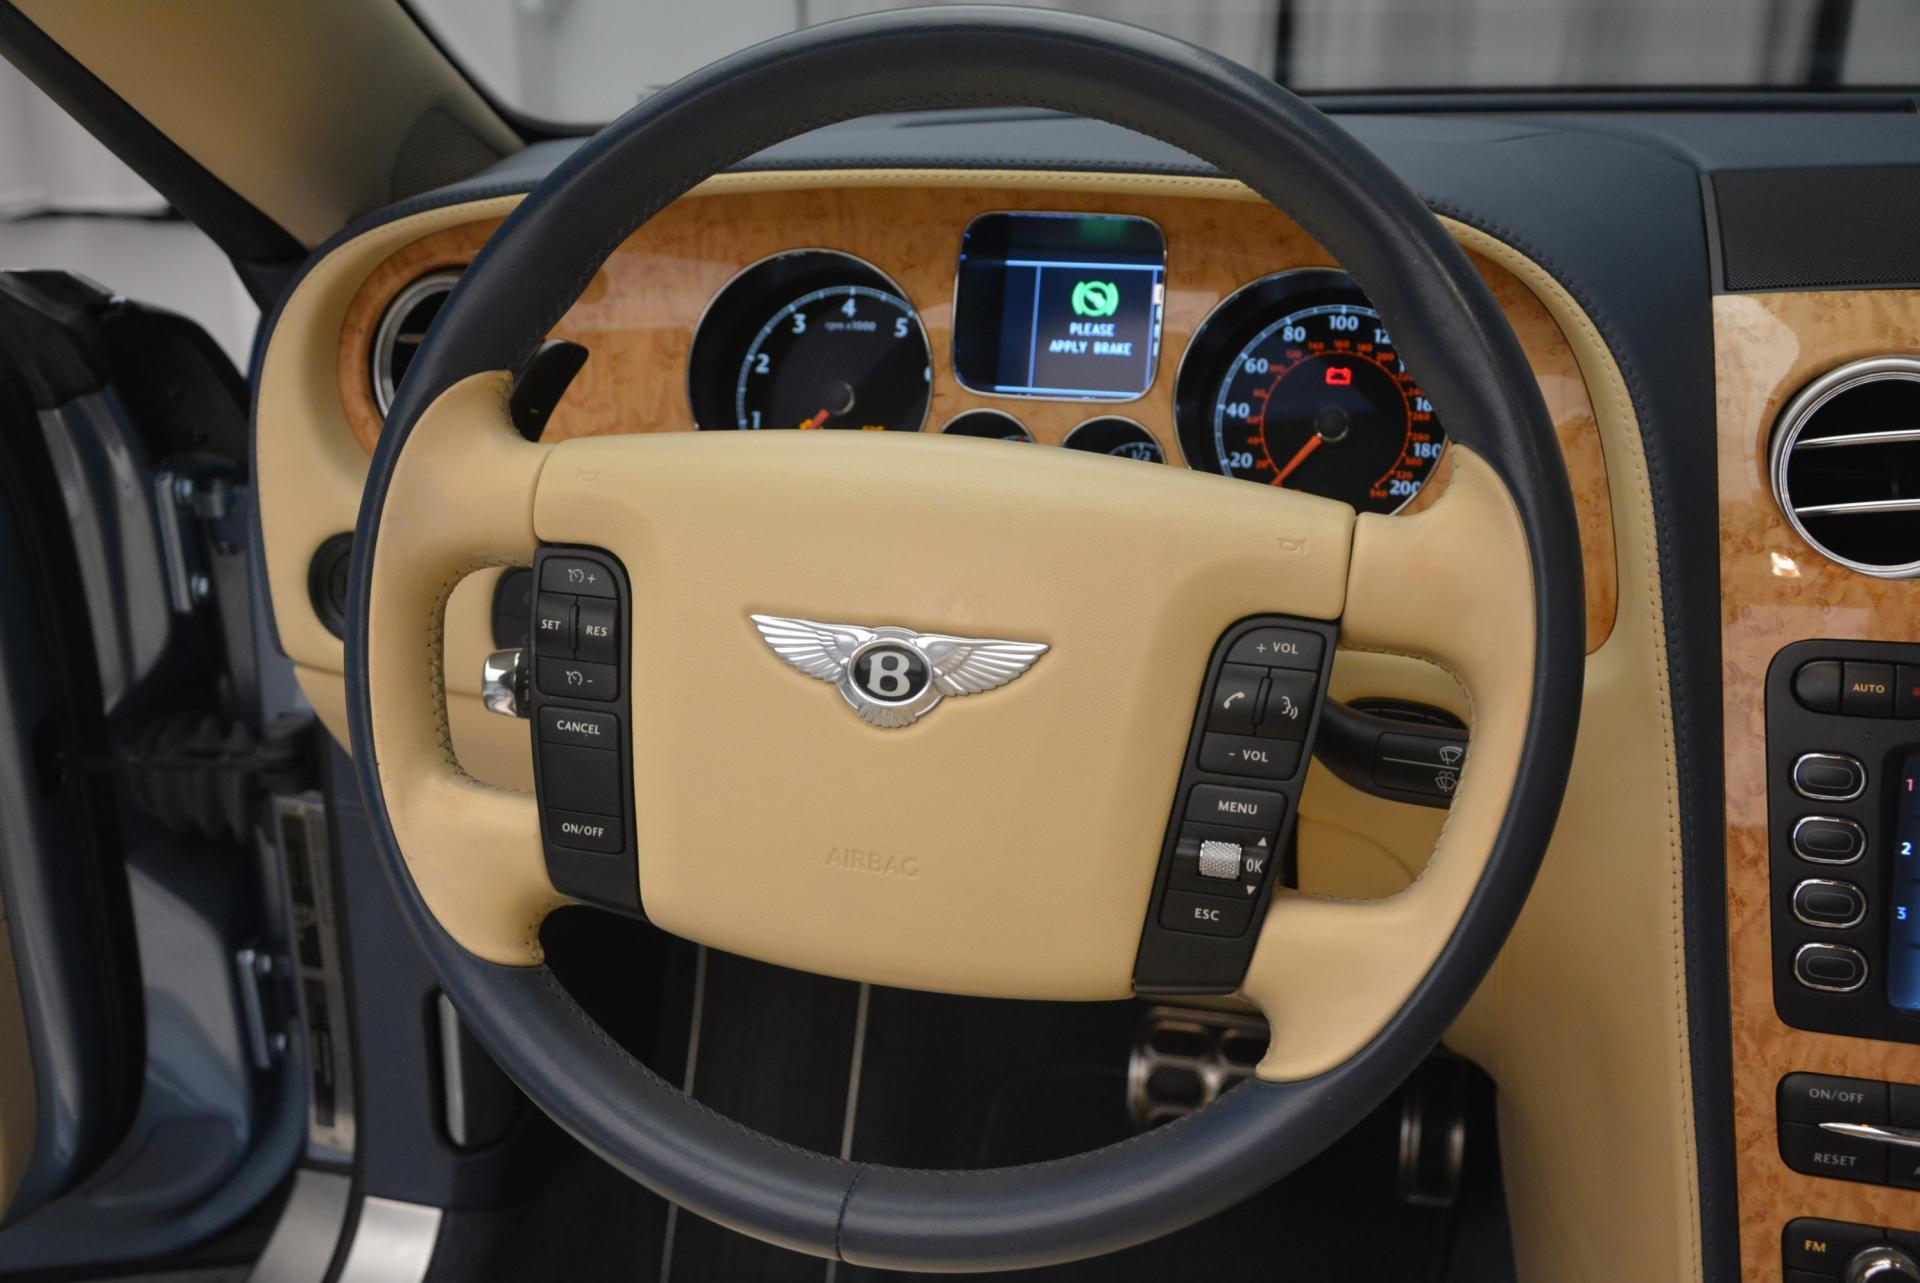 Used 2007 Bentley Continental GTC  For Sale In Westport, CT 495_p40